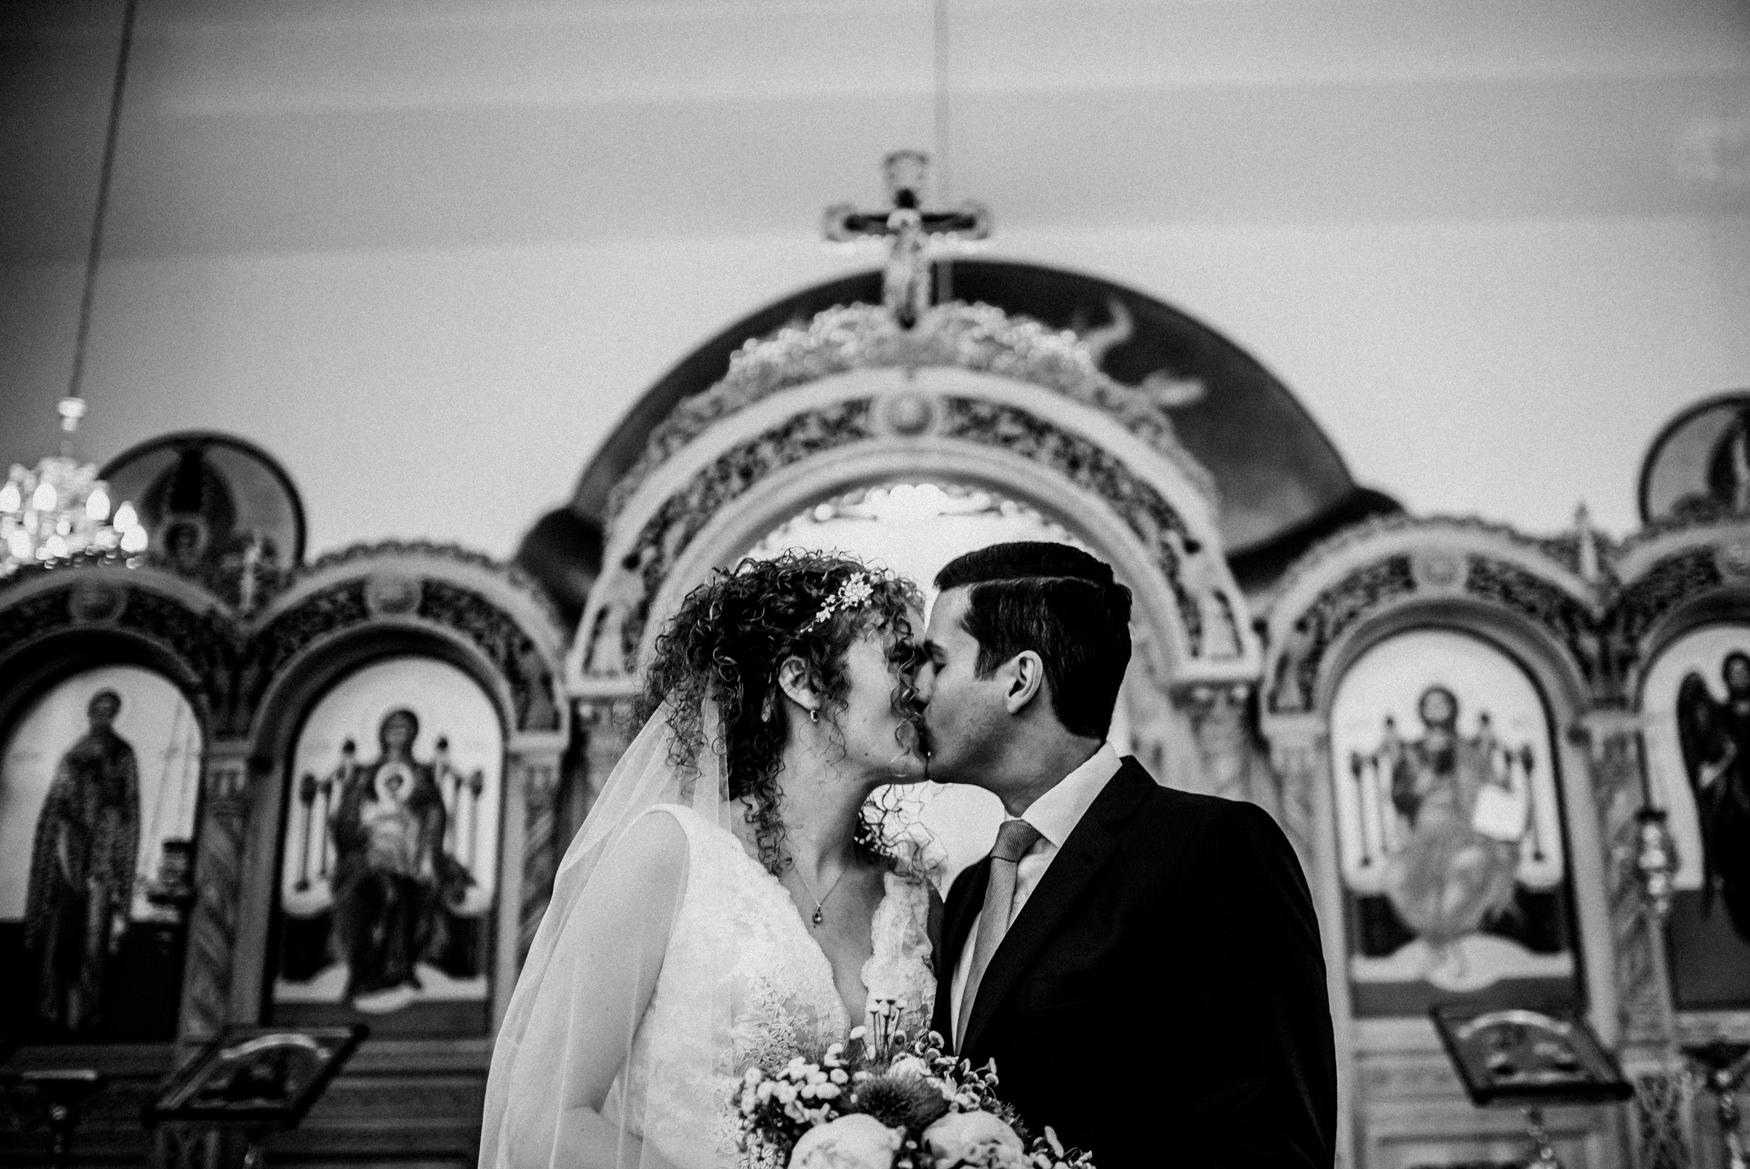 LR3 byblos beirut church wedding ceremony lebanon 013.jpg